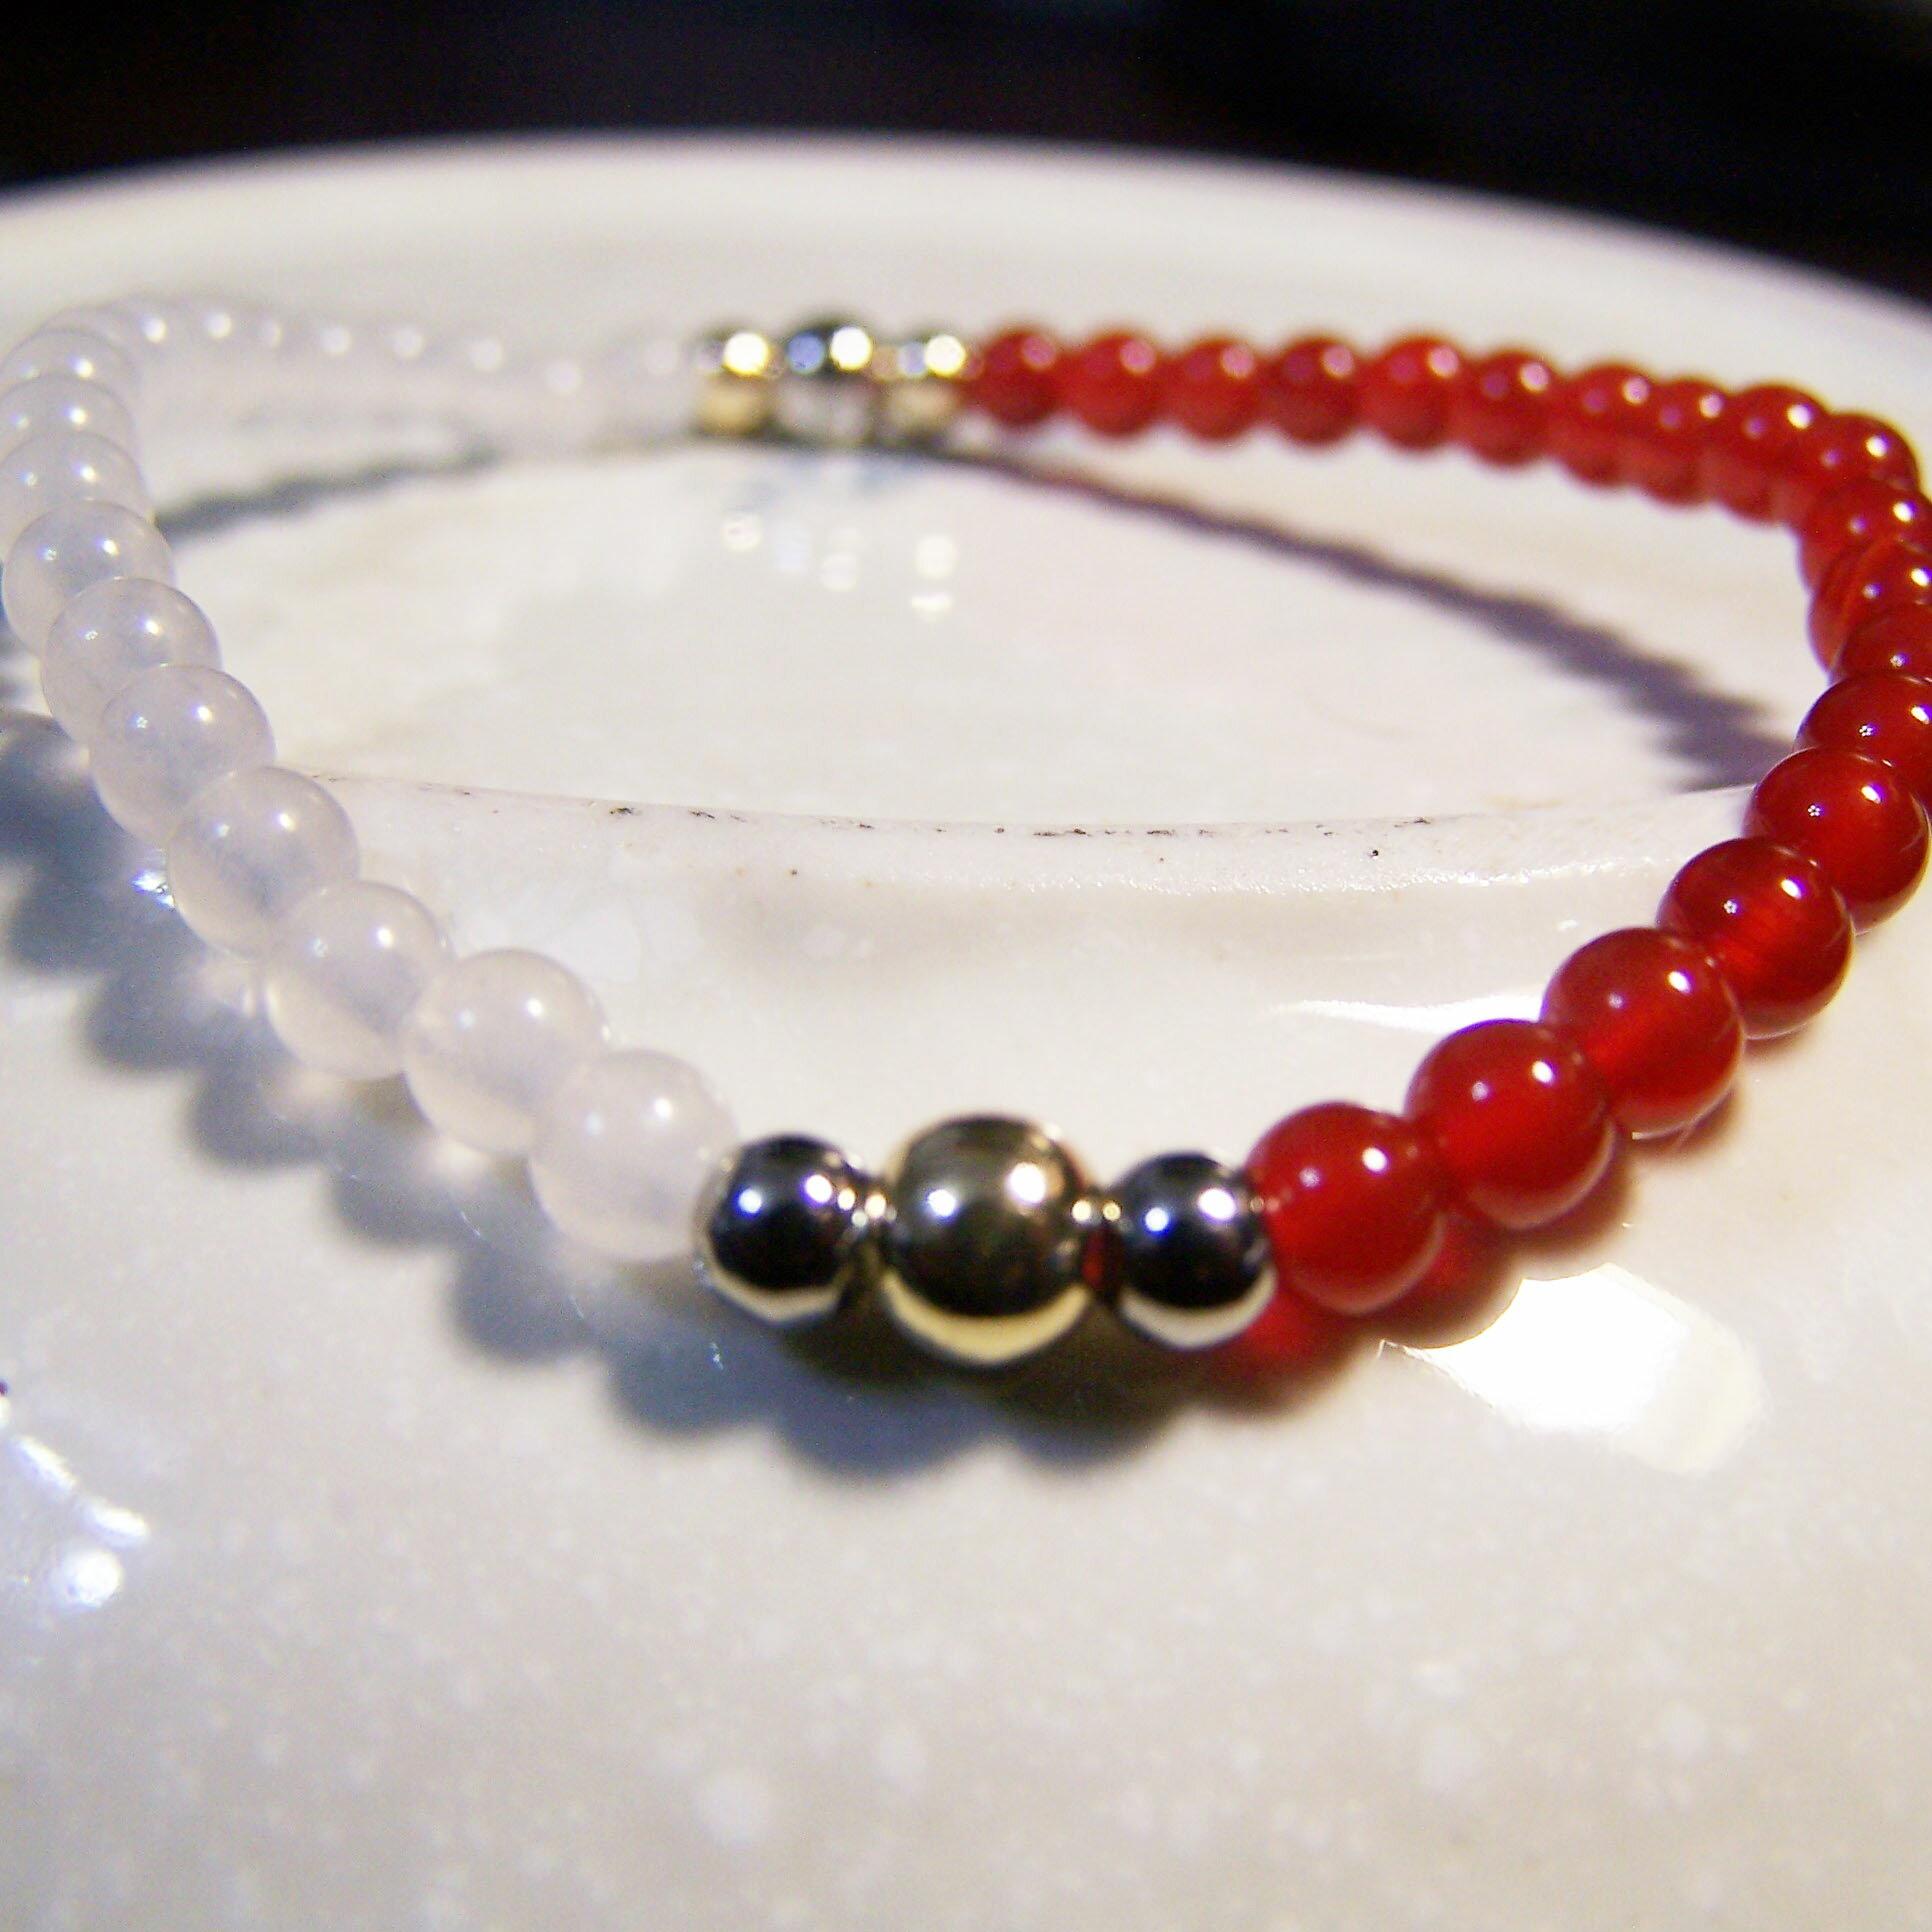 be young【比漾】Mini 秀麗手環 (紅瑪瑙+晶白玉) 單圈手鏈 0